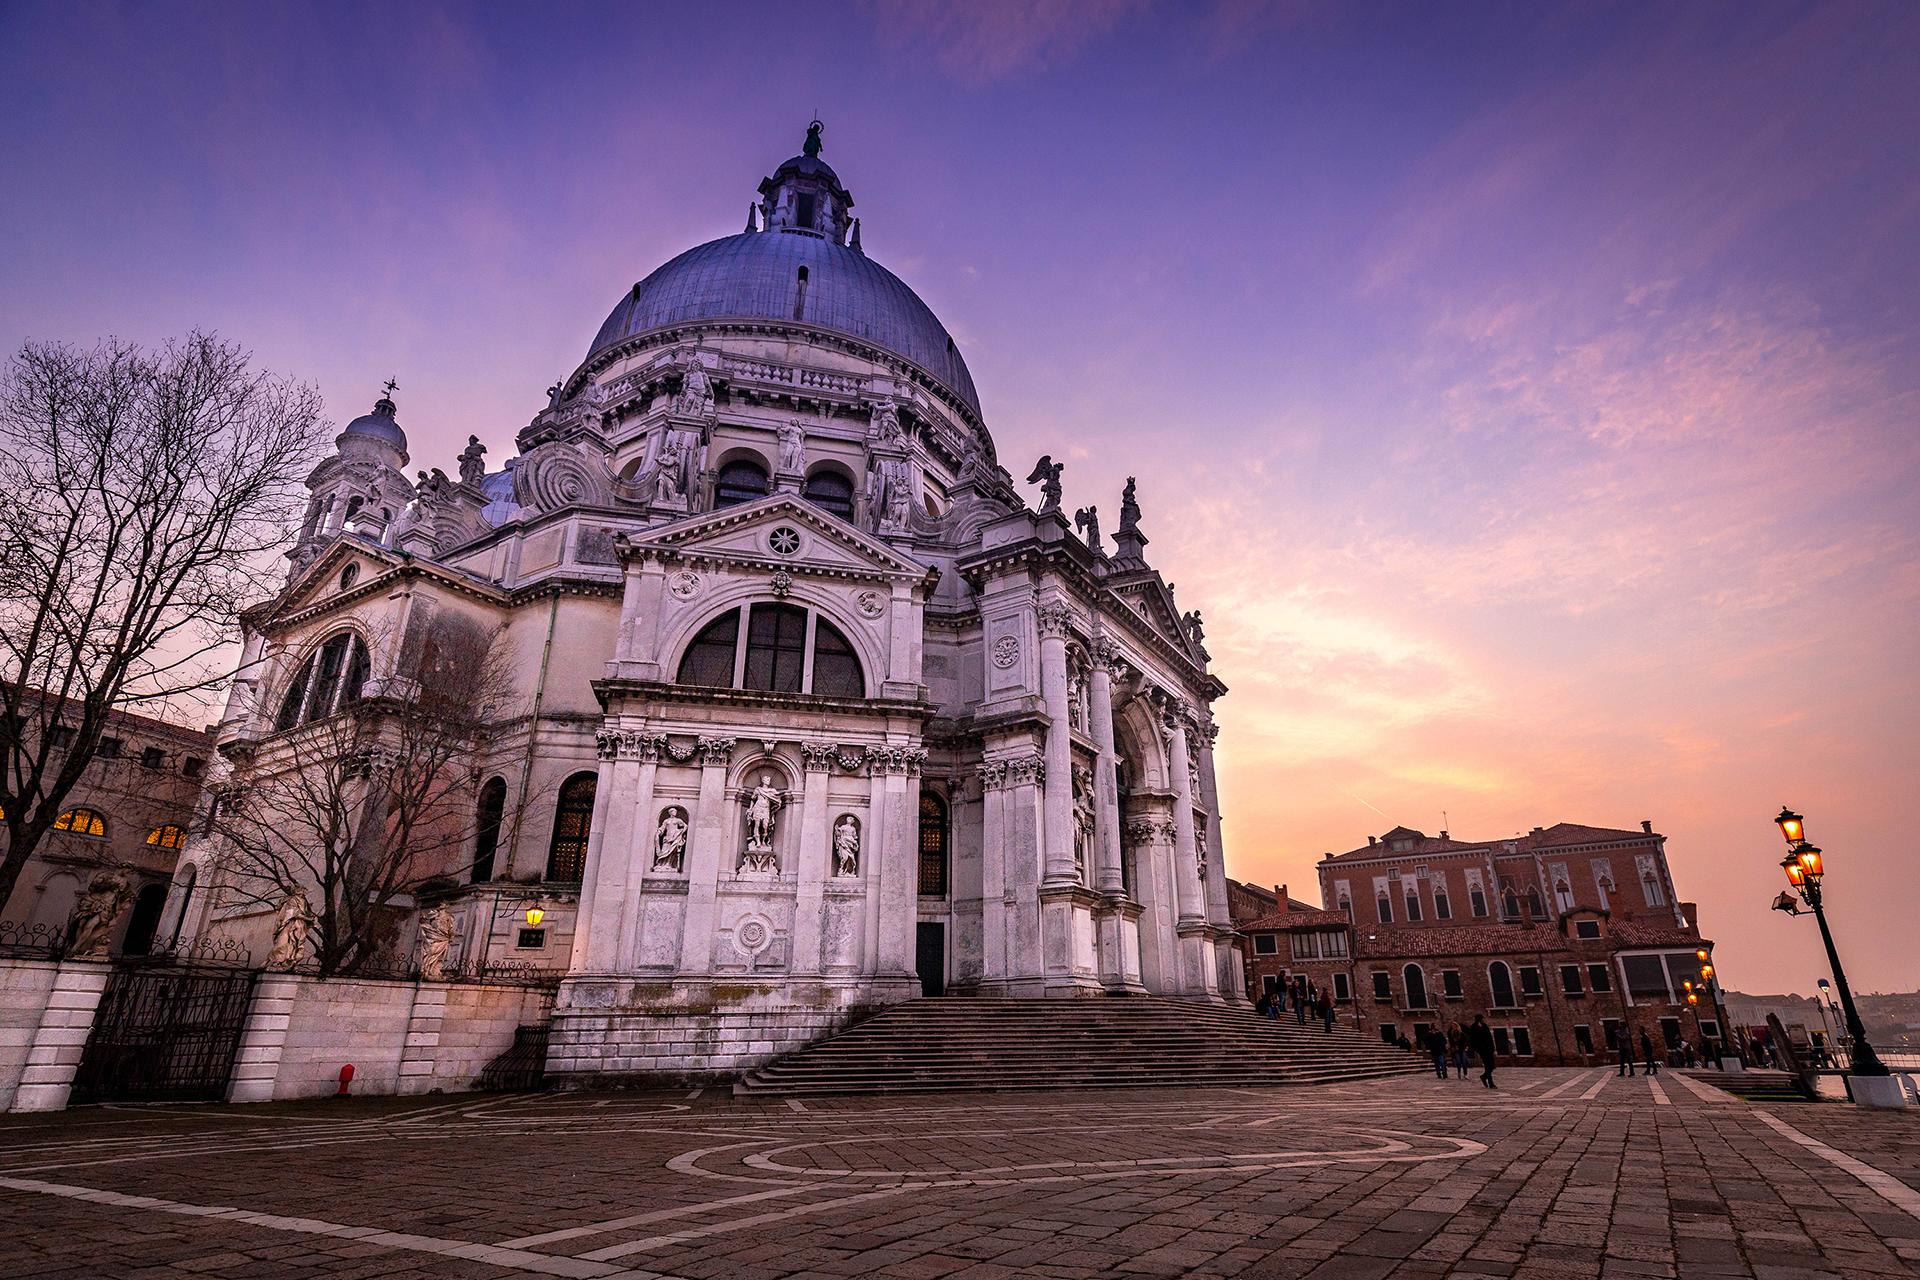 Santa Maria della Salute, Italy